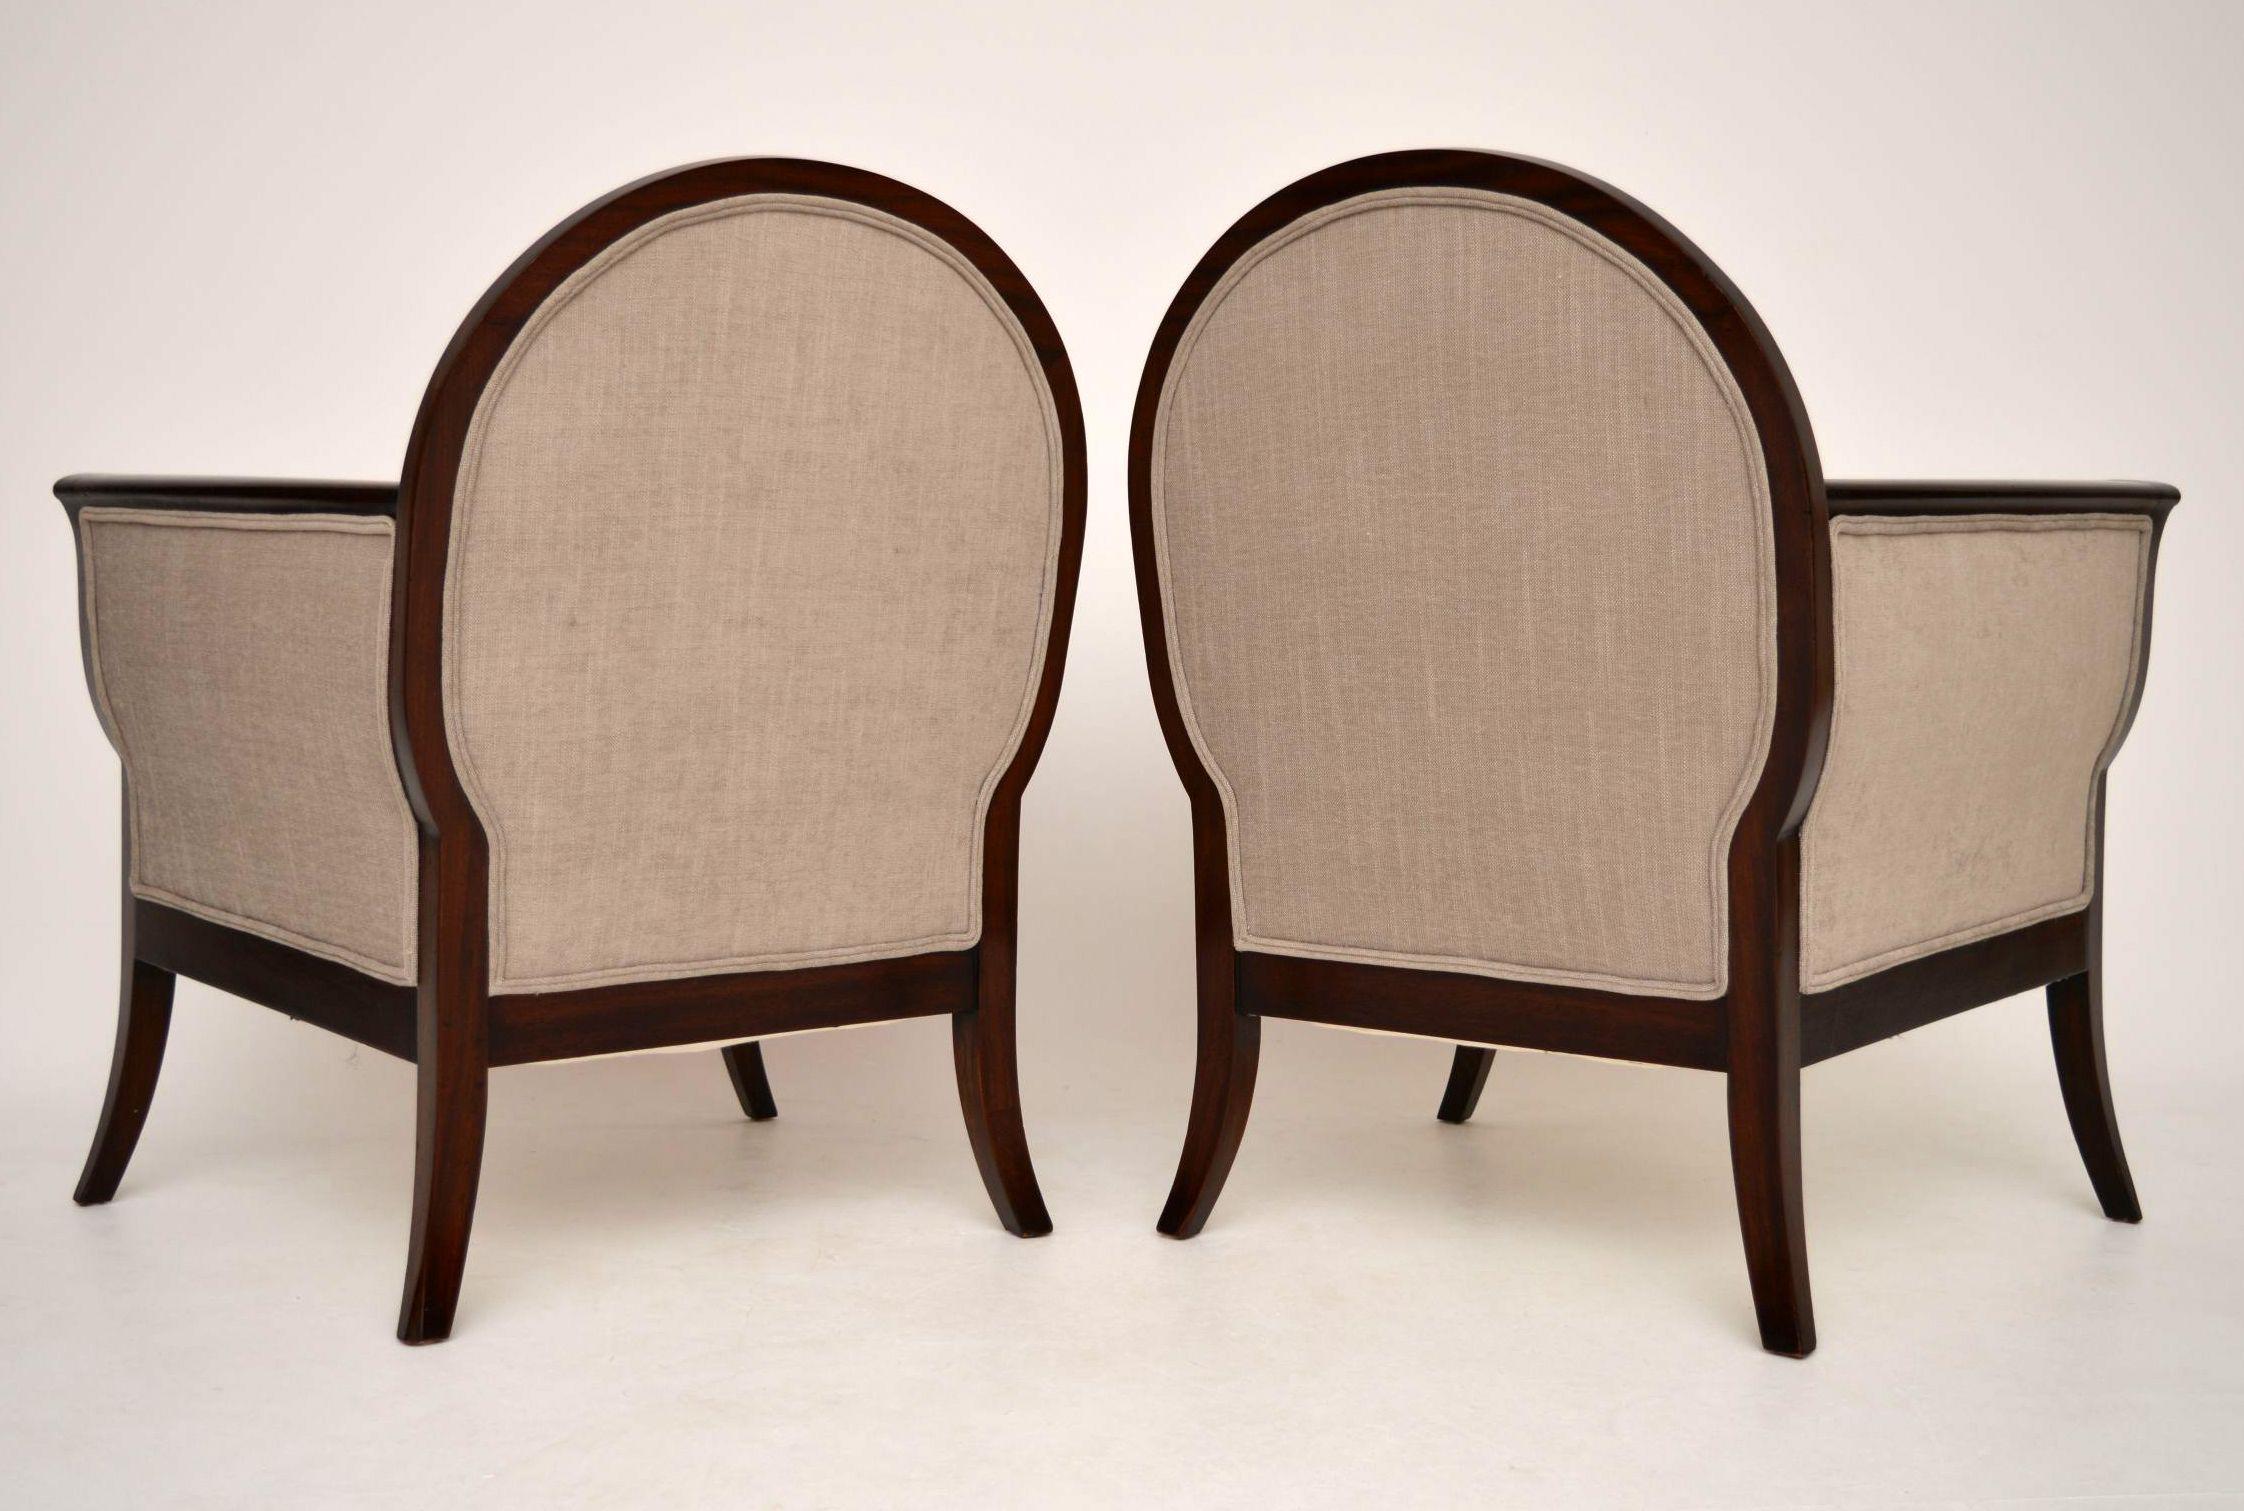 ein paar antike schwedische mahagoni sessel. Black Bedroom Furniture Sets. Home Design Ideas